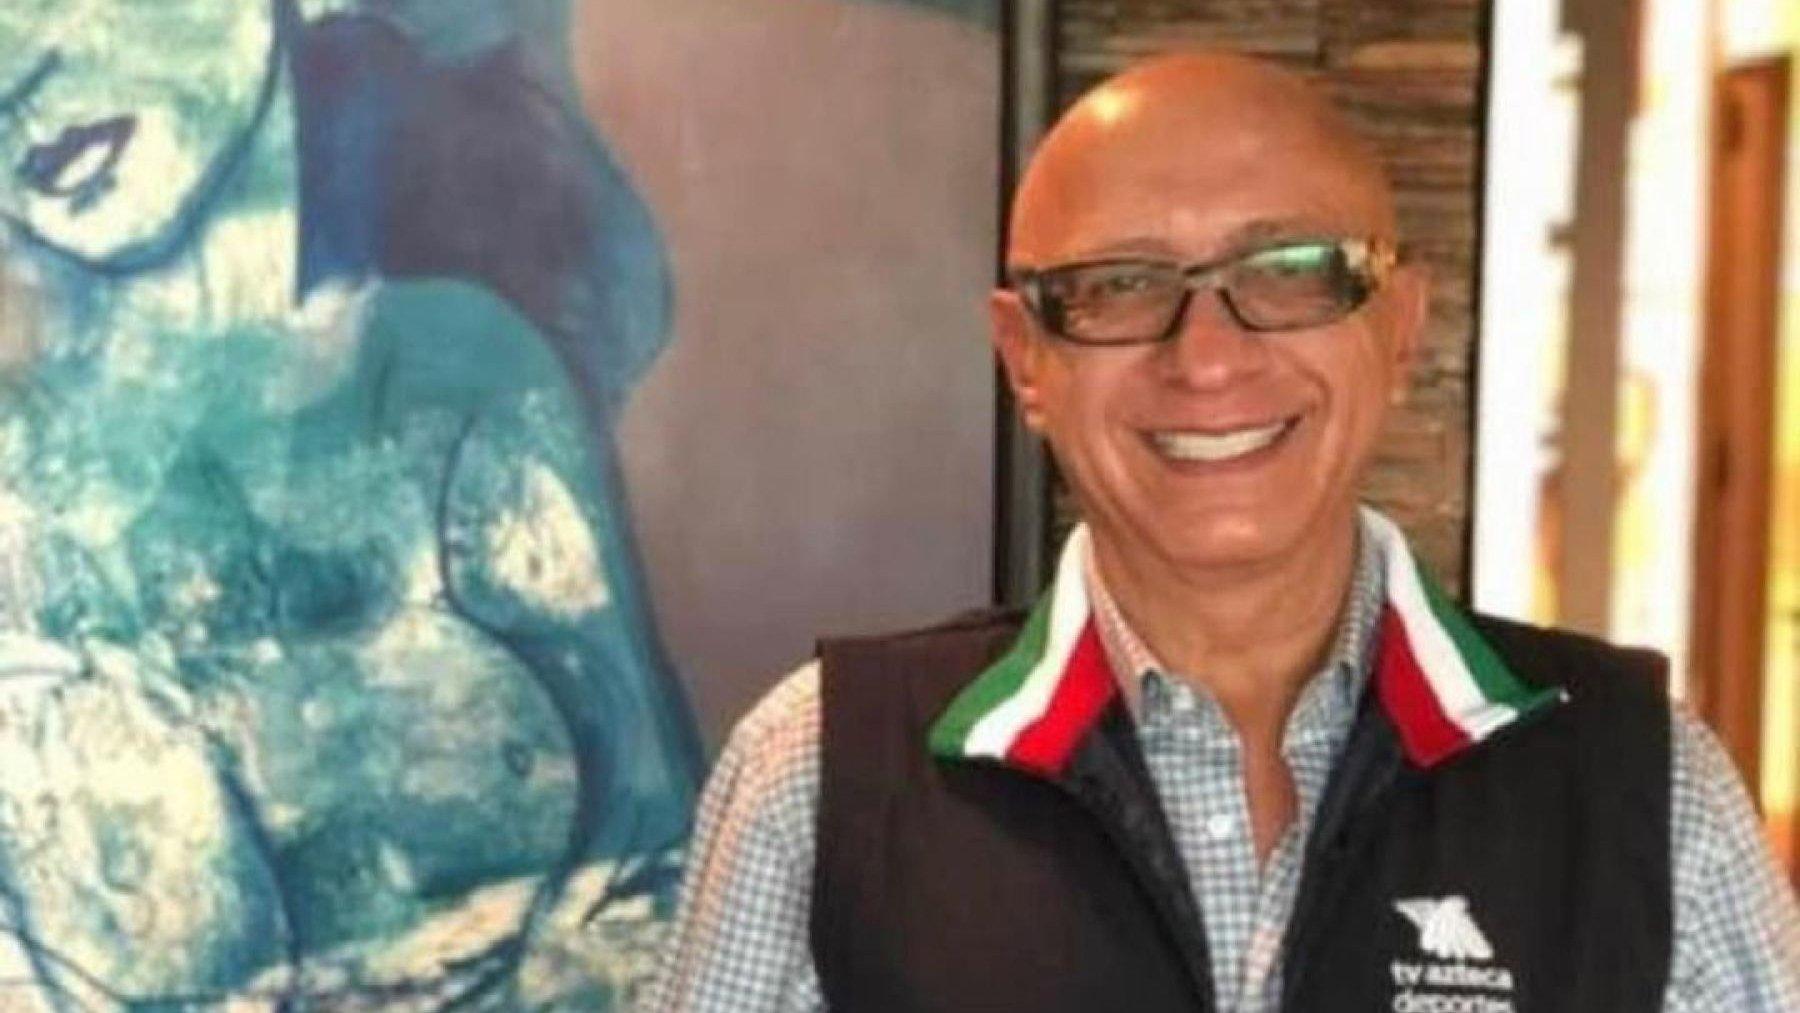 TV Azteca executive Alberto Siurana Covit-19 dies